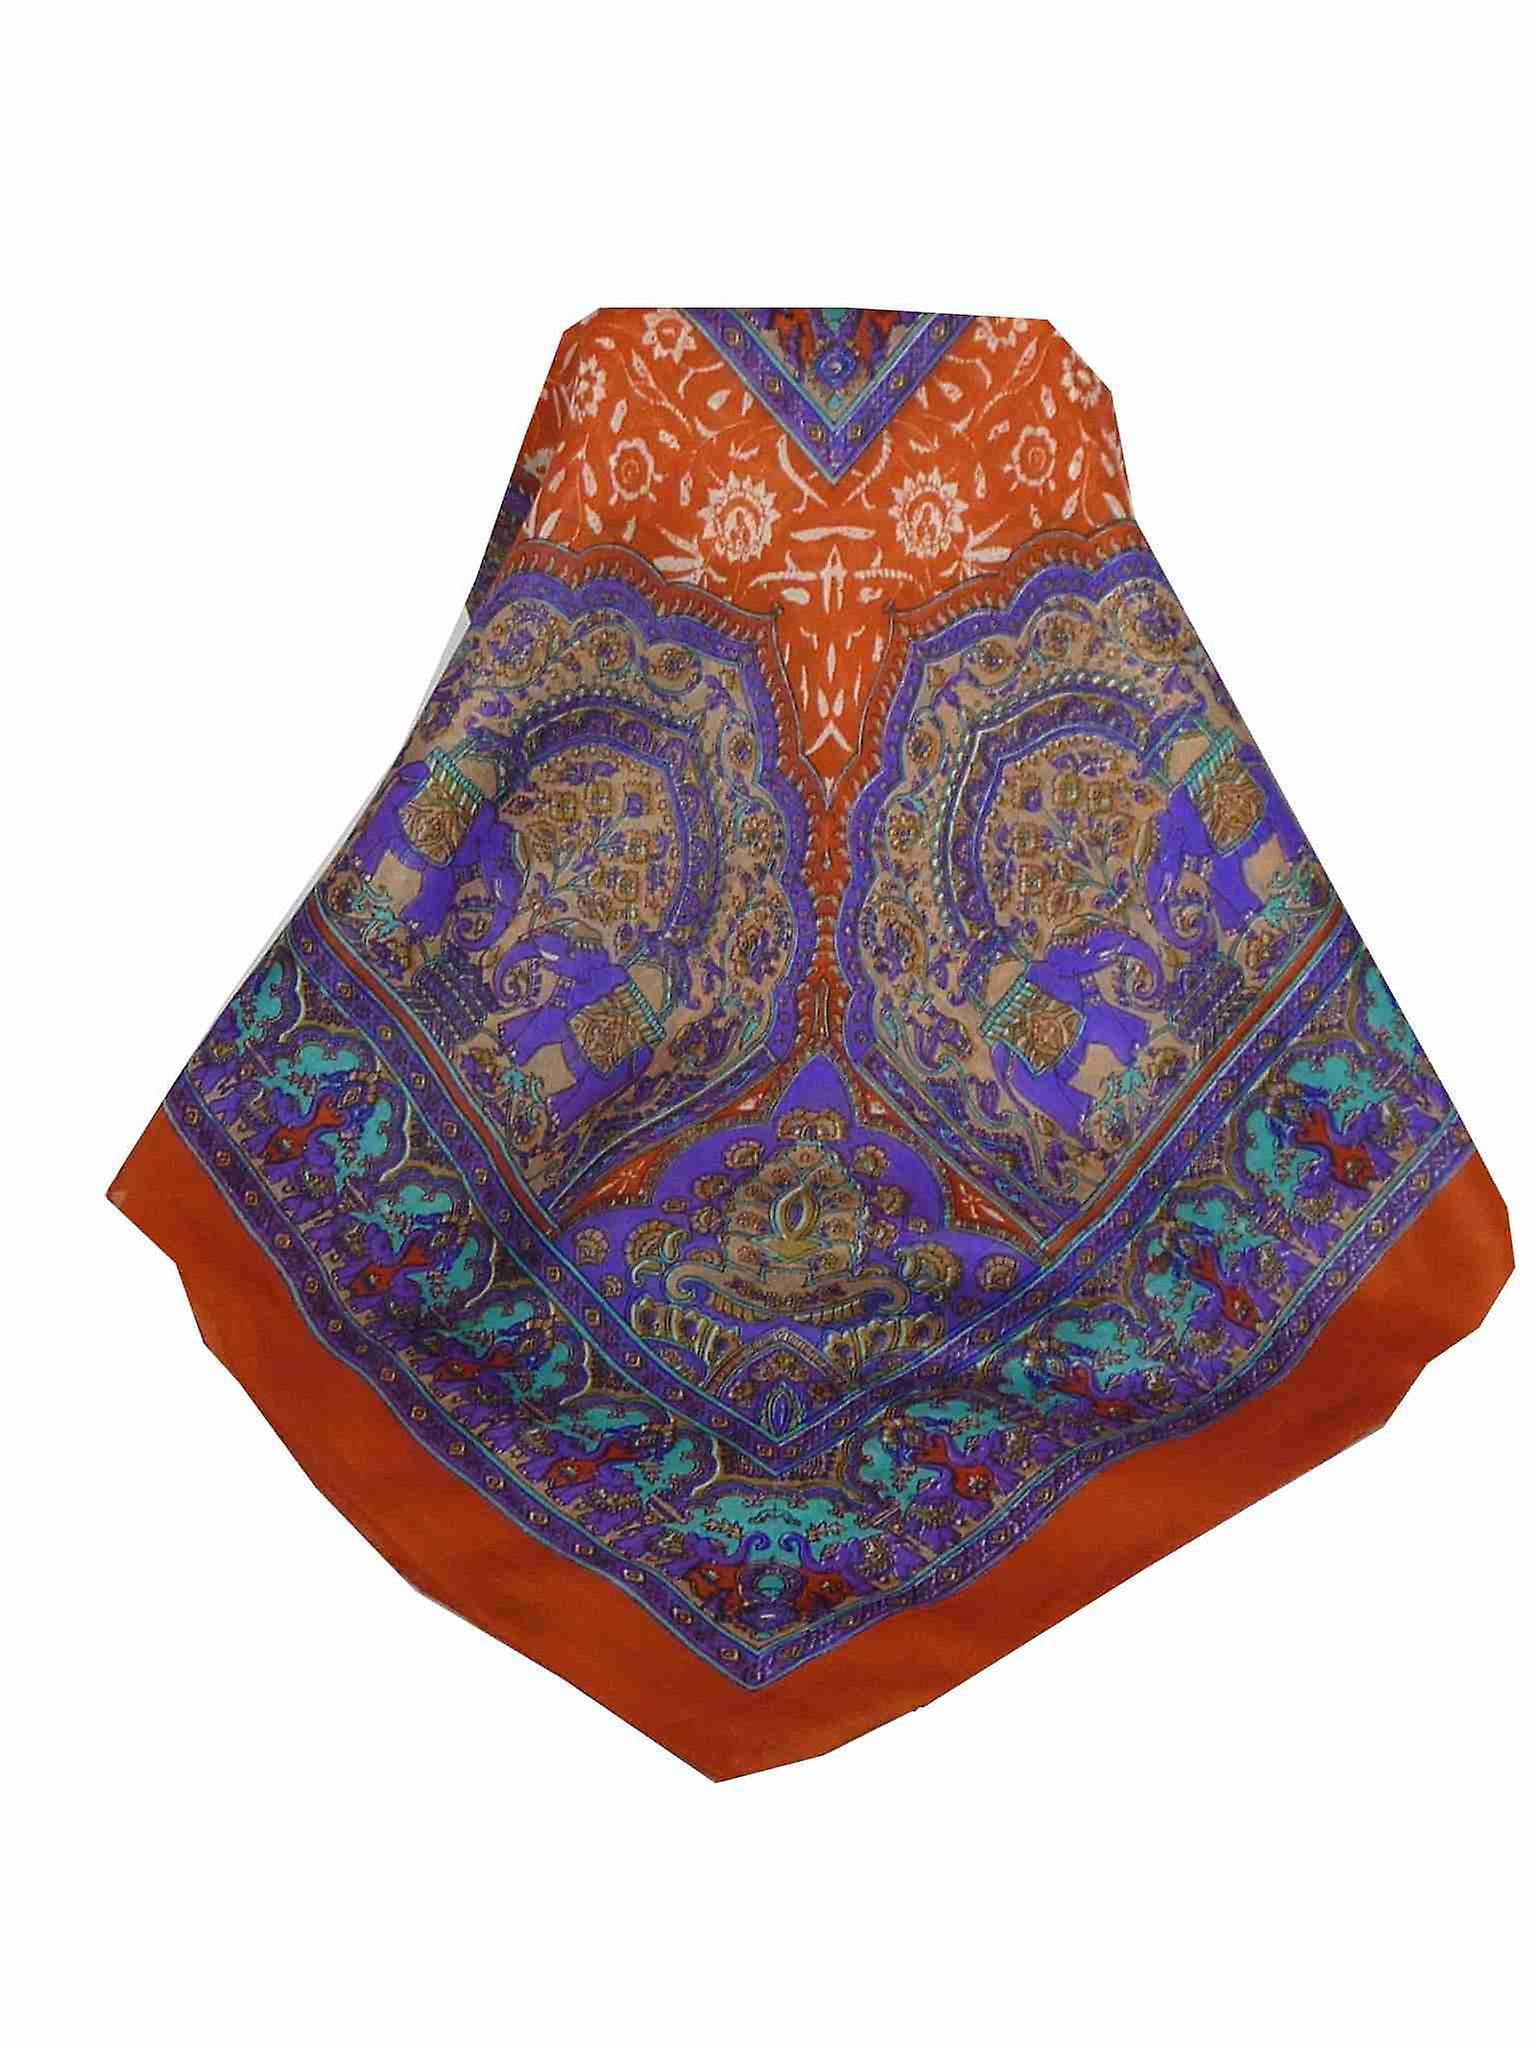 Mulberry Silk Traditional Square Scarf Ravali Terracotta & Indigo by Pashmina & Silk